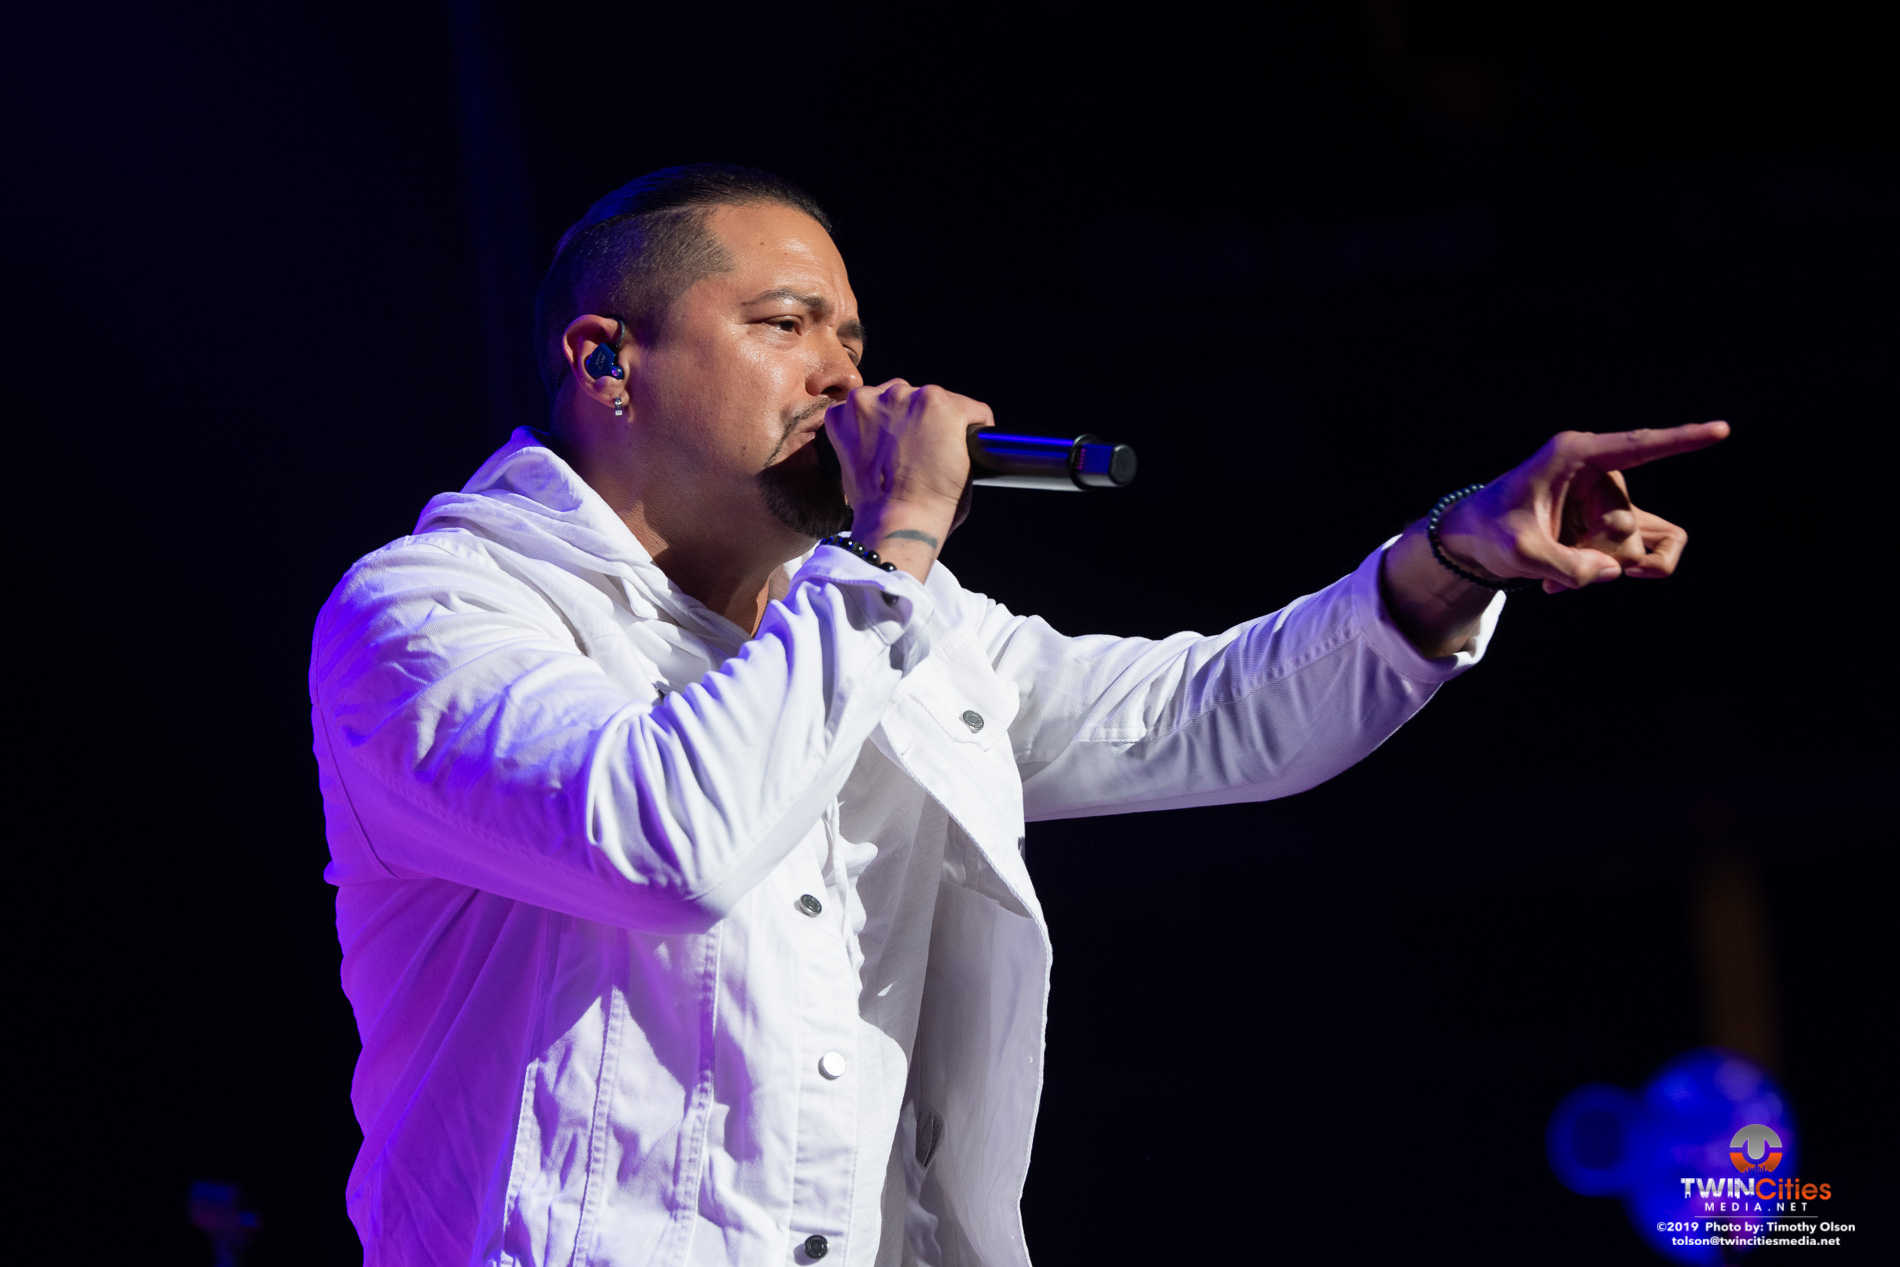 Carlos-Santana-3-Aug-2019-Xcel-Photo-13